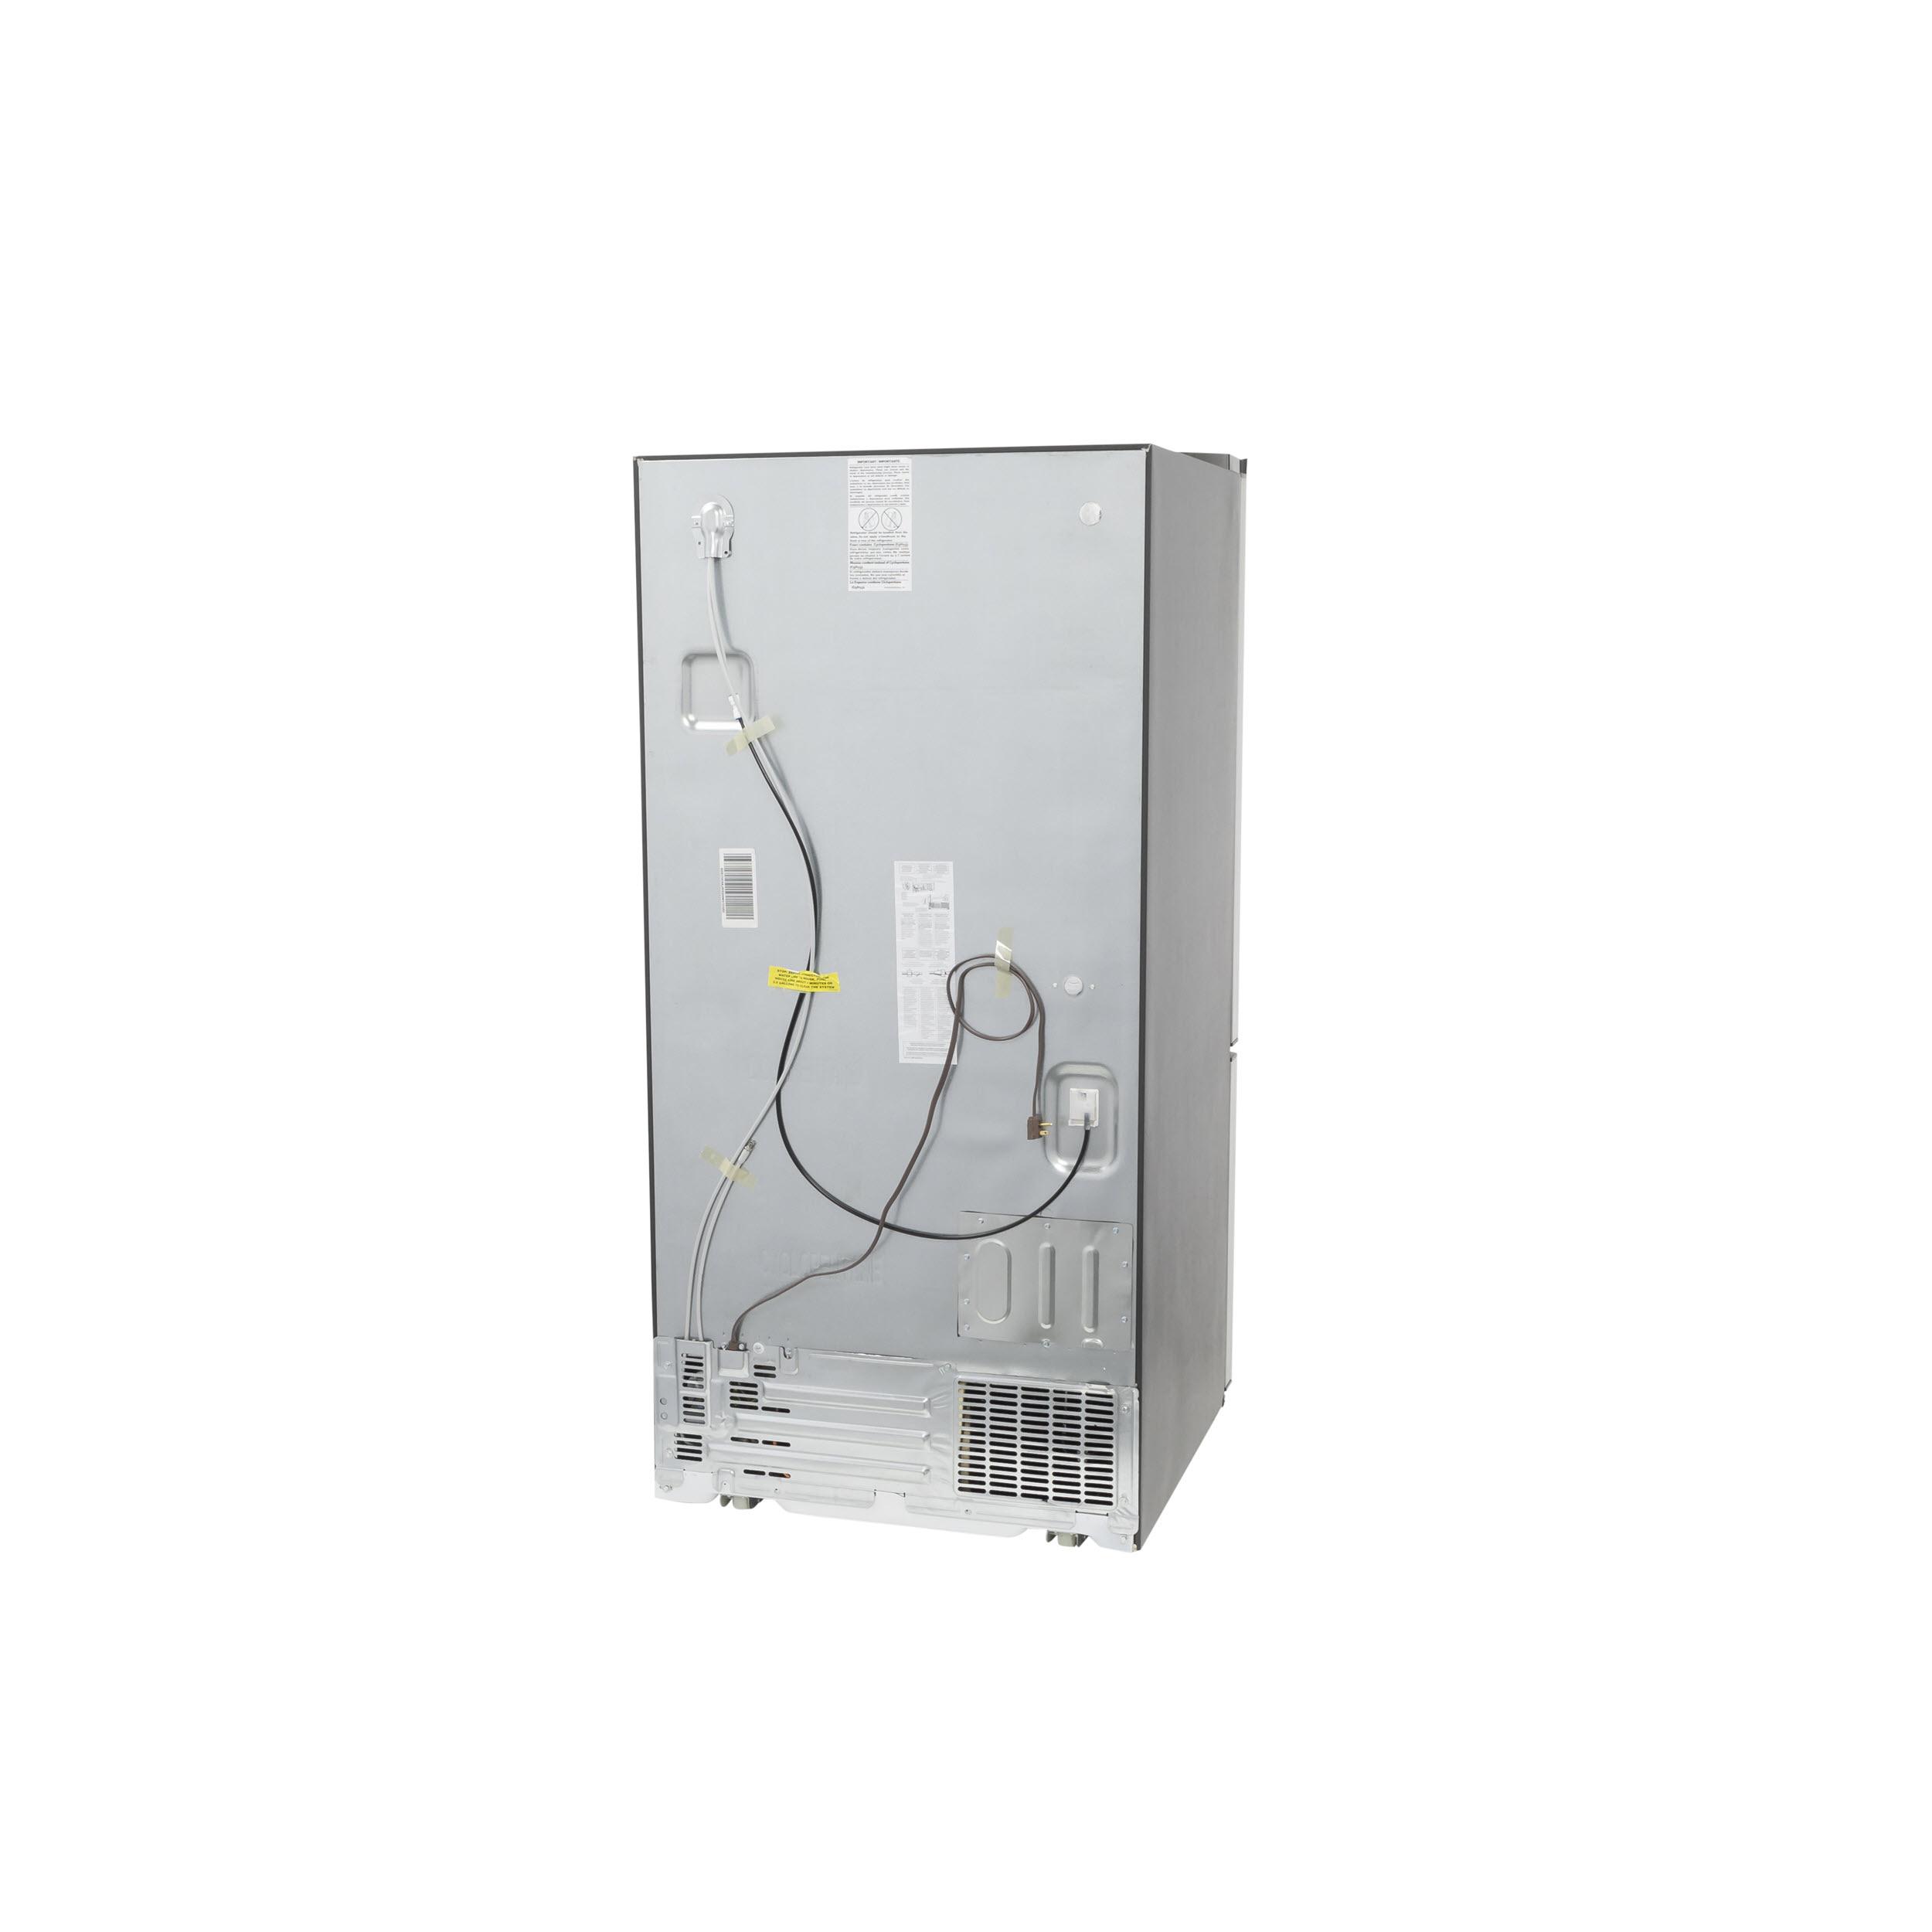 Model: GDE25ESKSS | GE GE® ENERGY STAR® 24.8 Cu. Ft. Bottom-Freezer Drawer Refrigerator